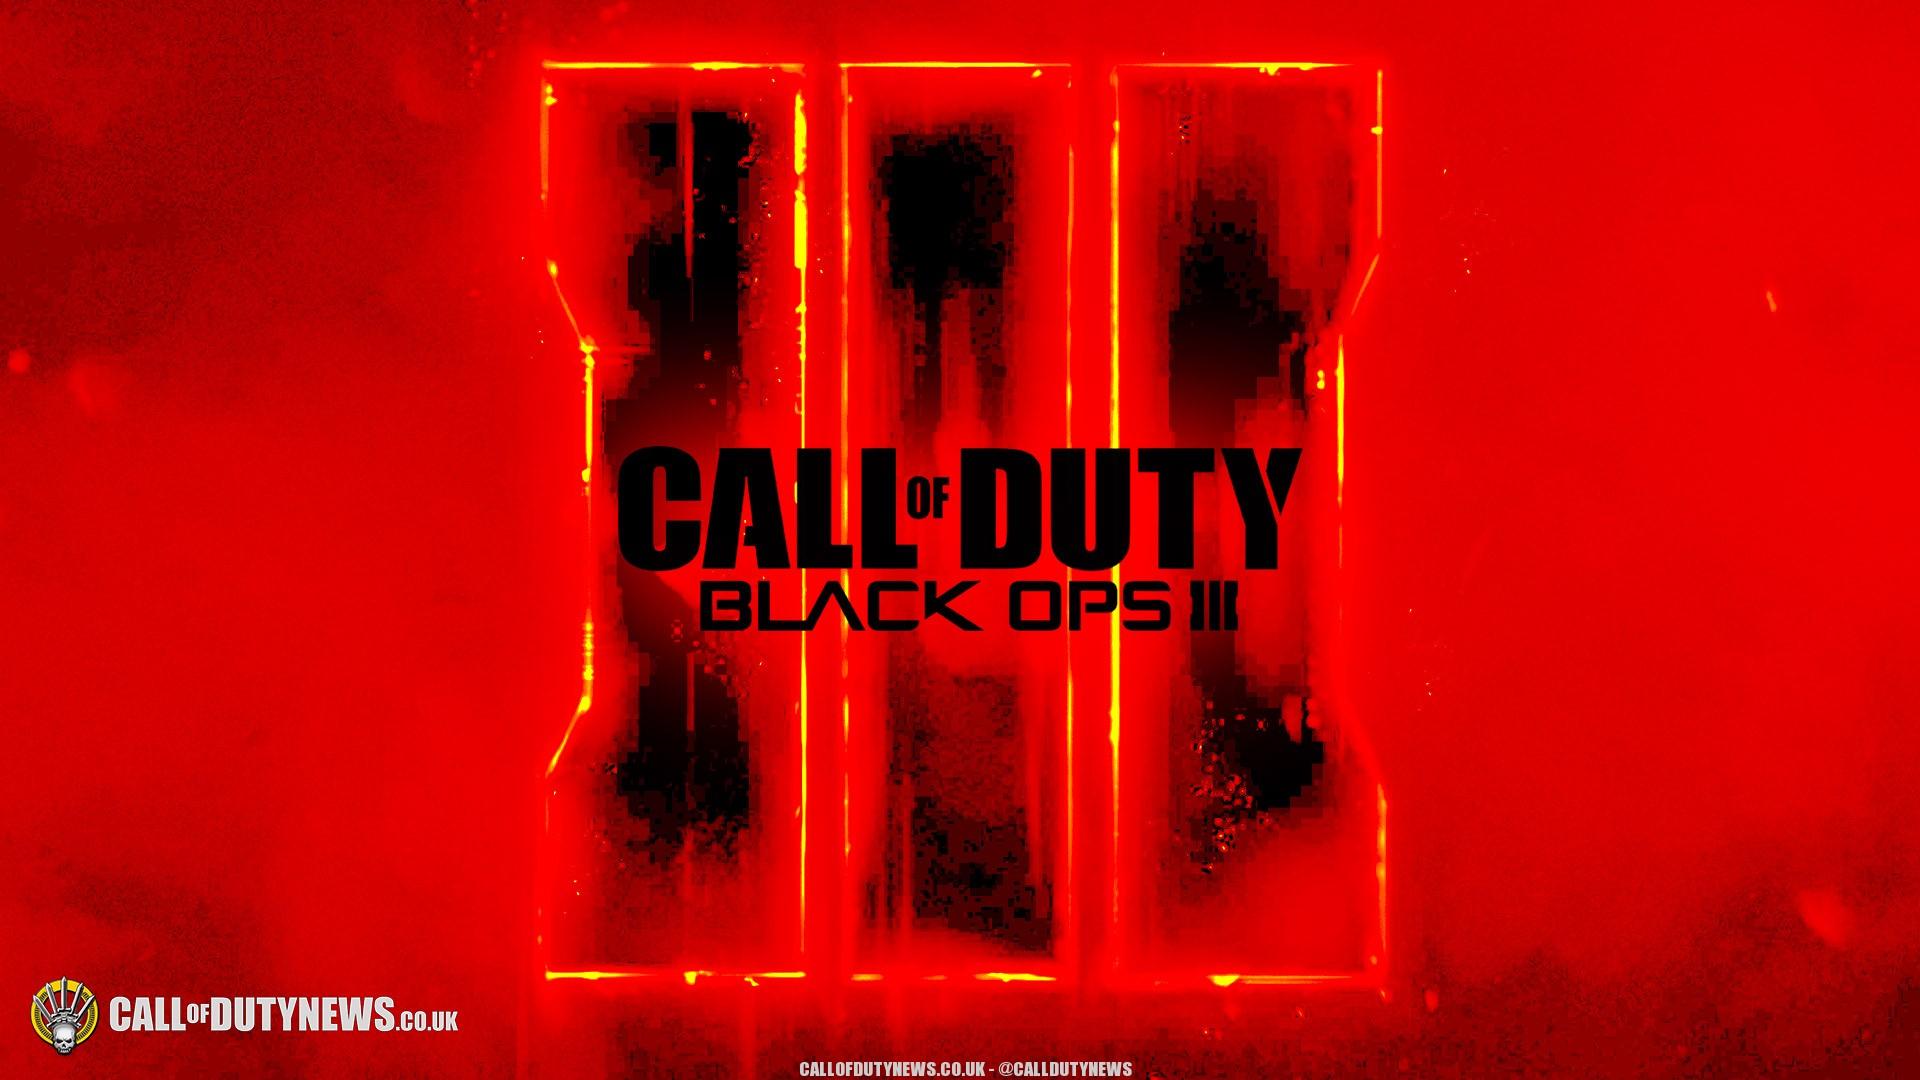 black ops 3 bo3 wallpaper 19 Call of Duty Blog 1920x1080